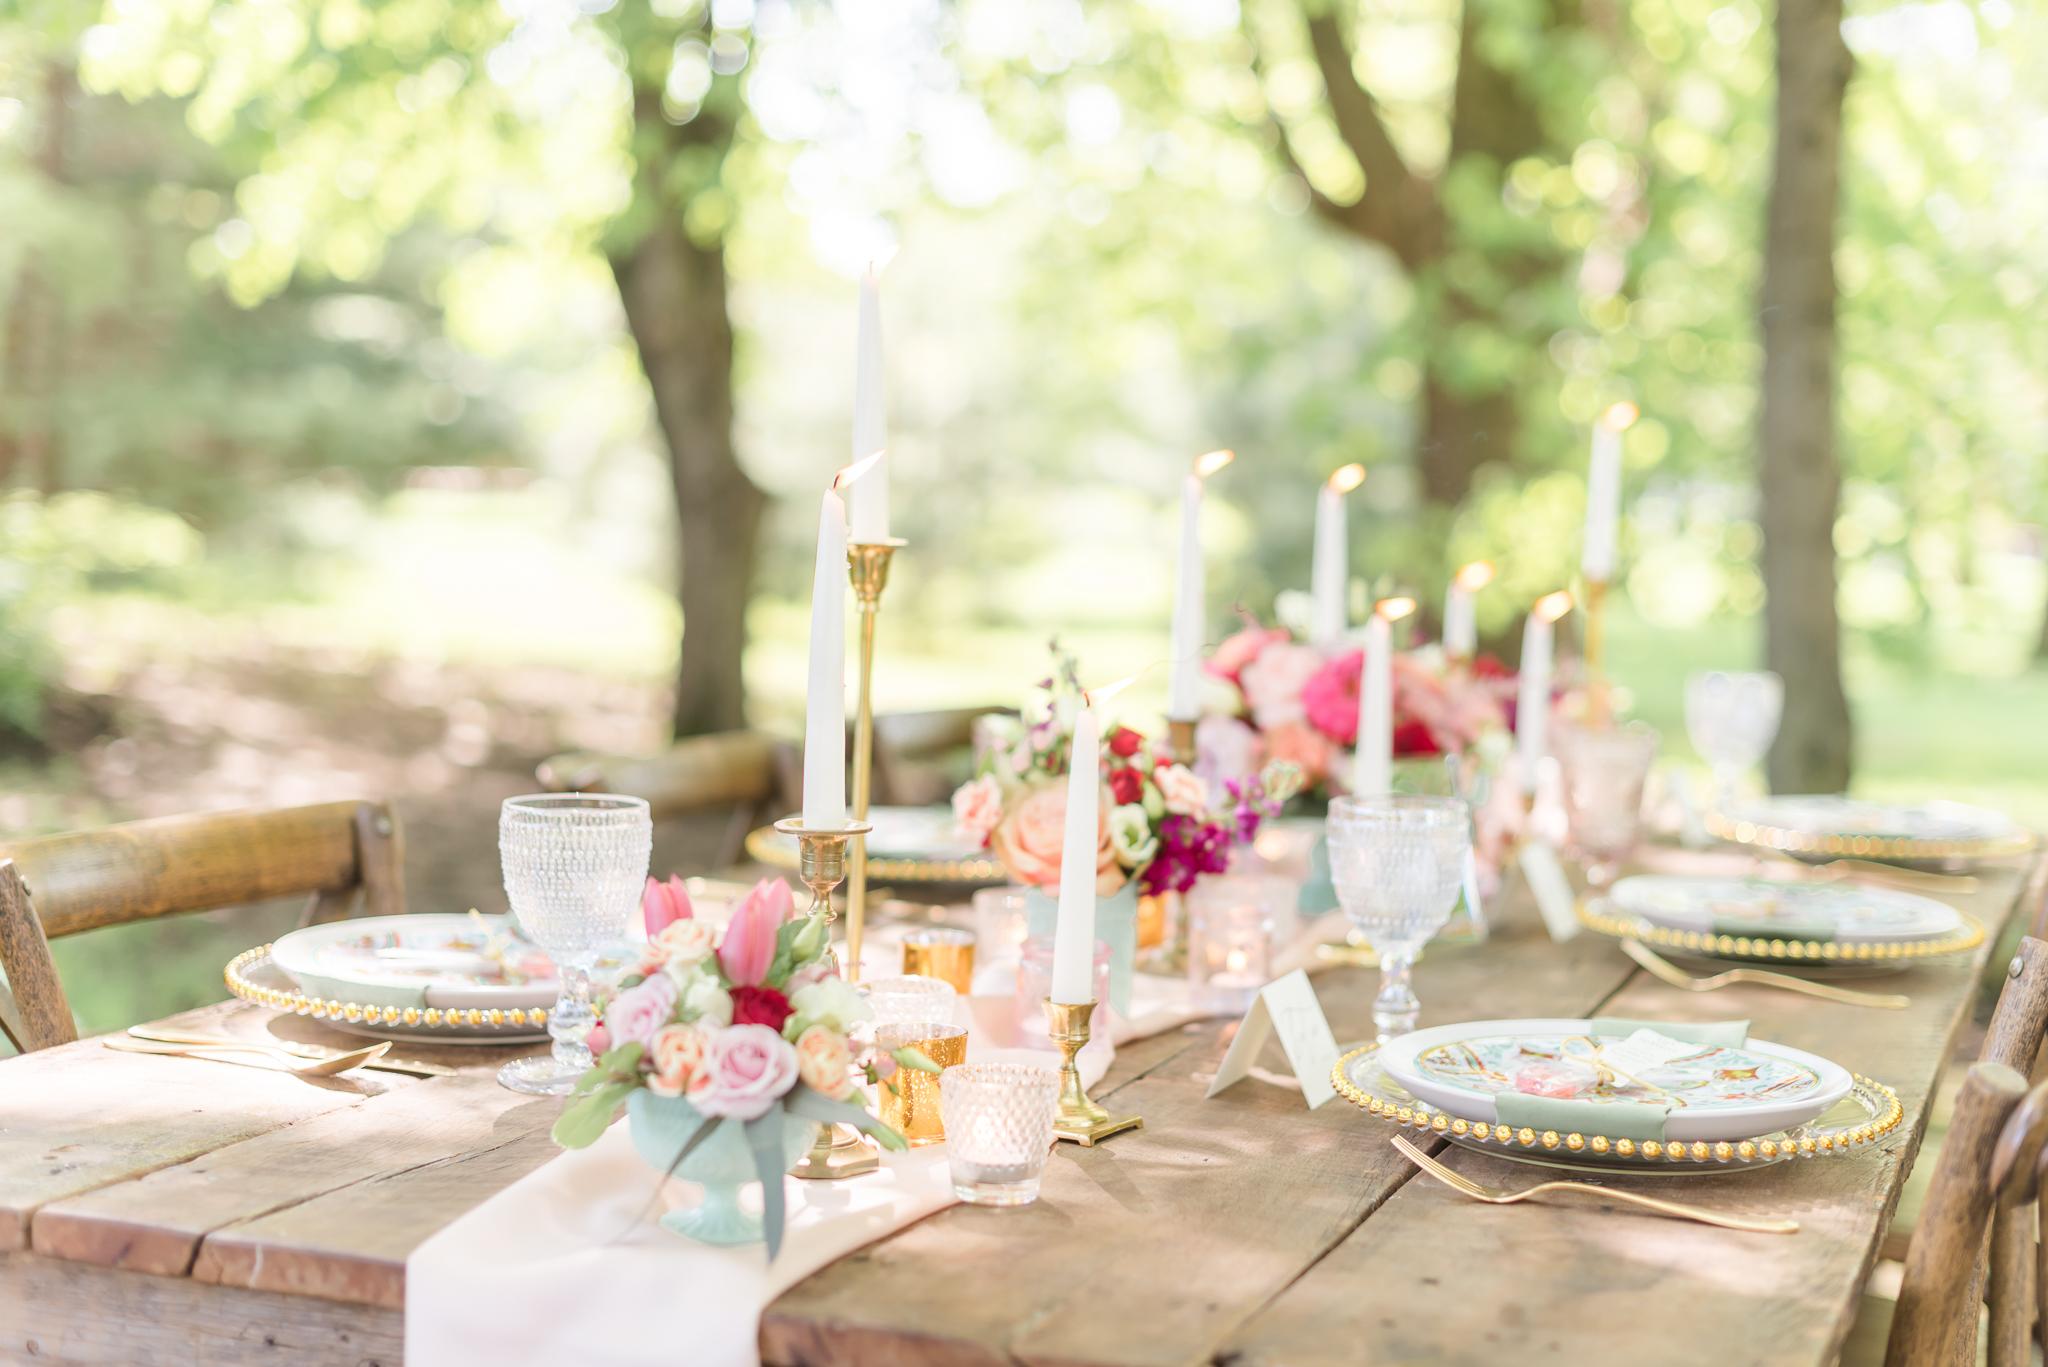 Mustard Seed Gardens Wedding Indianapolis Noblesvile Fishers Wedding Photographer-8.jpg